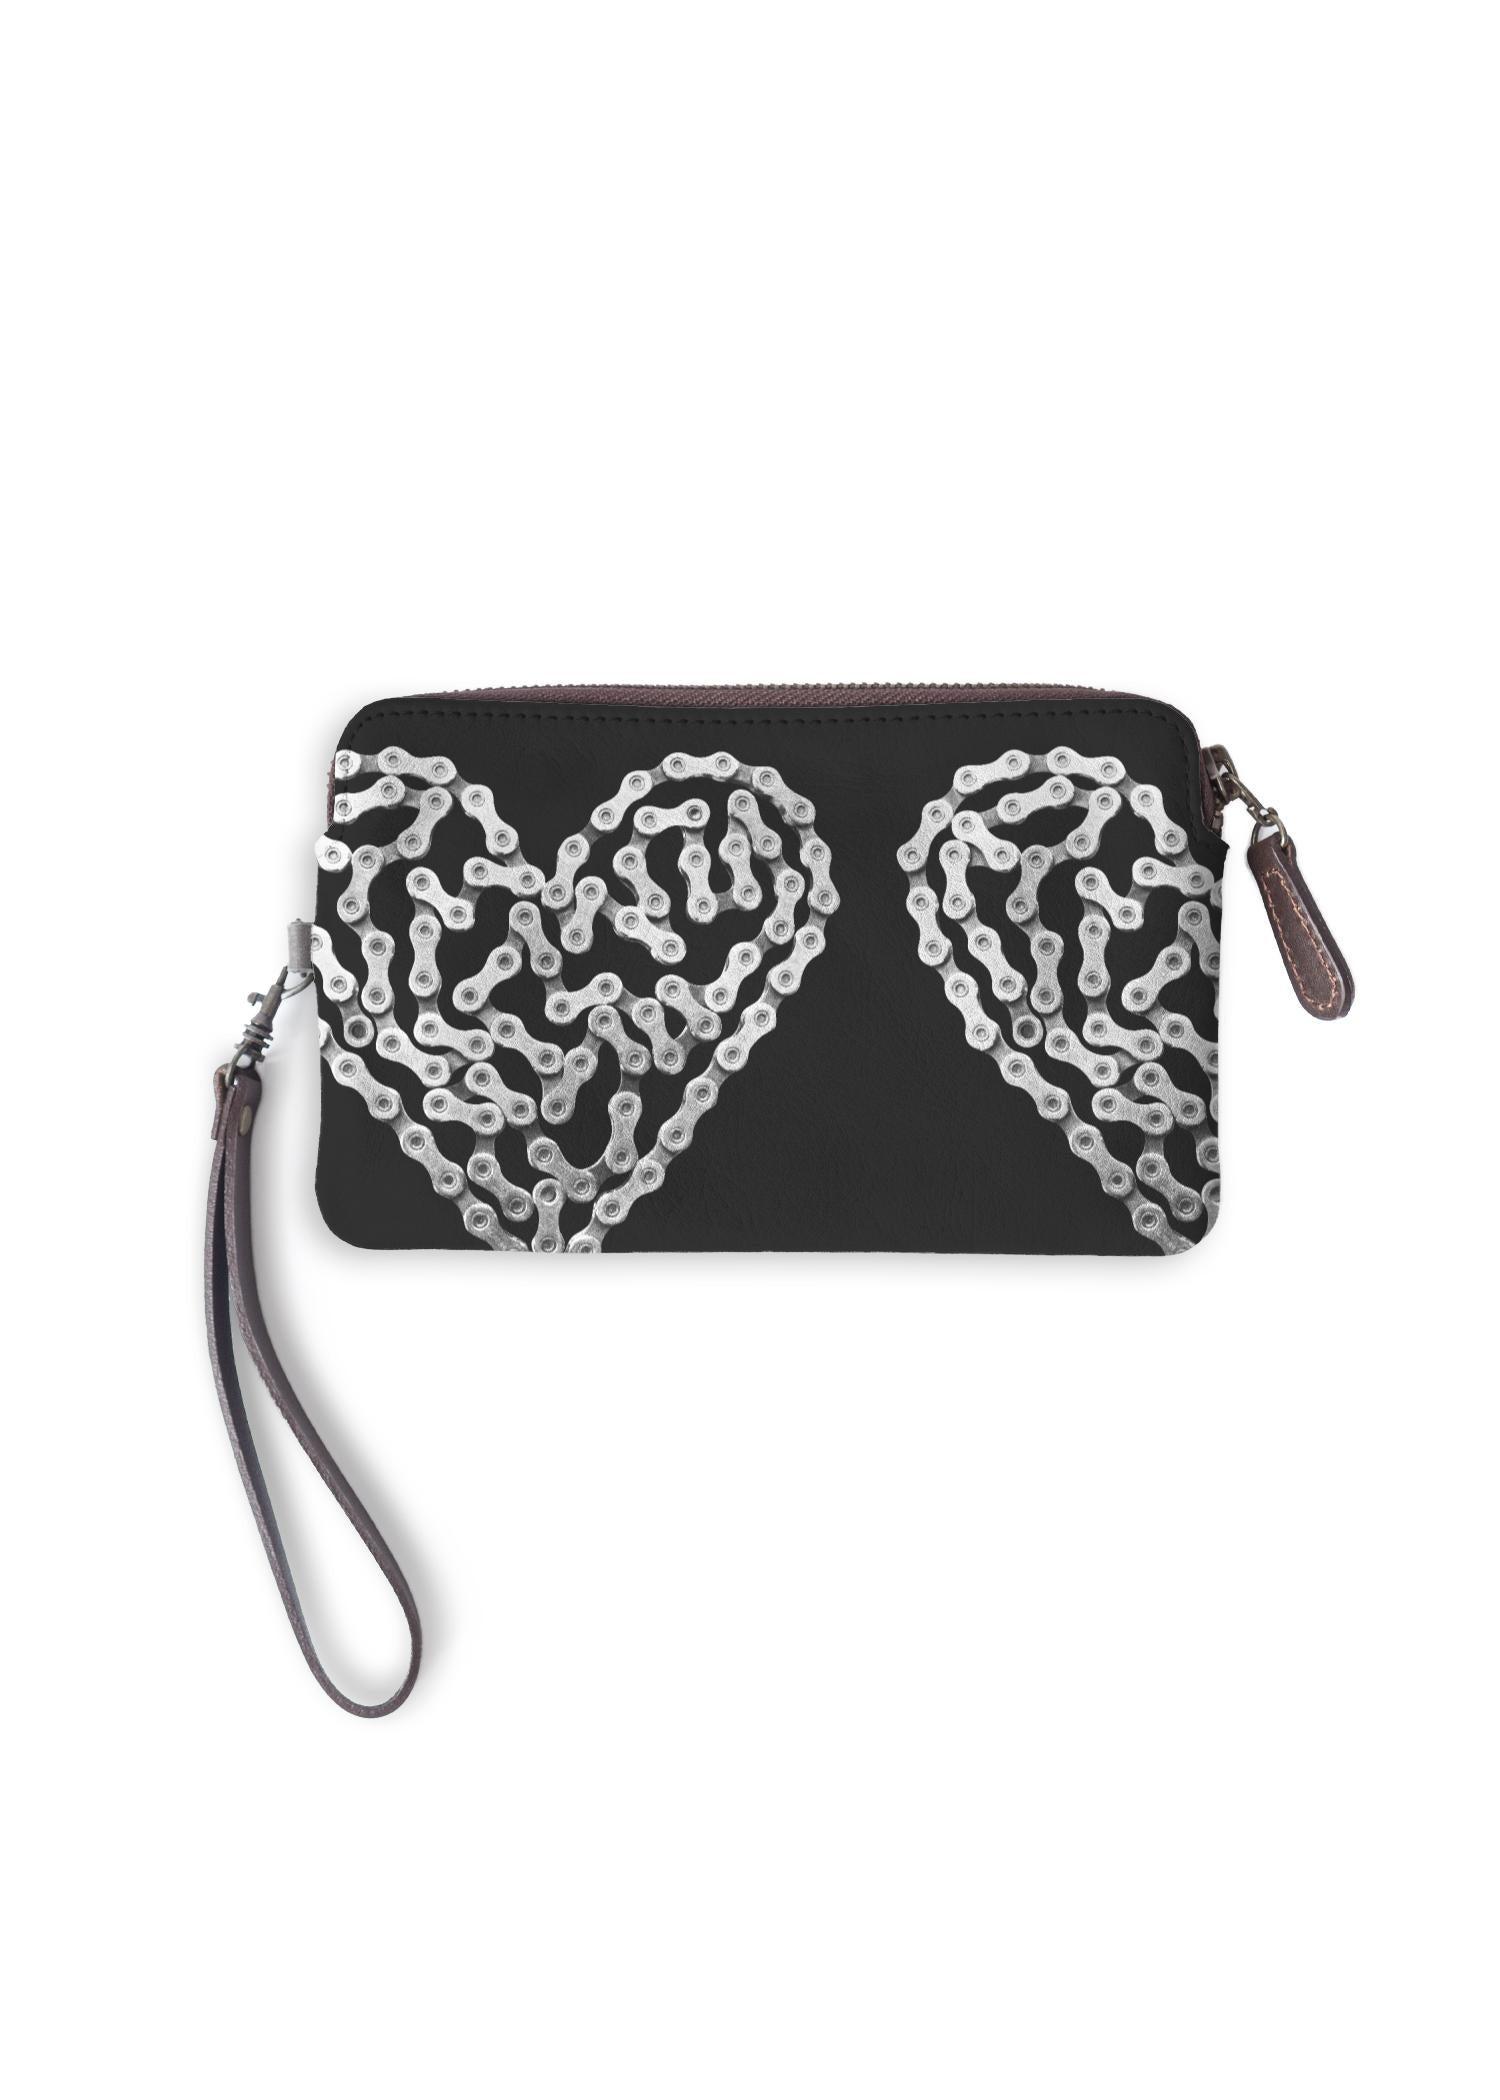 VIDA Leather Statement Clutch - Bike Chain Heart by VIDA Original Artist  - Size: One Size